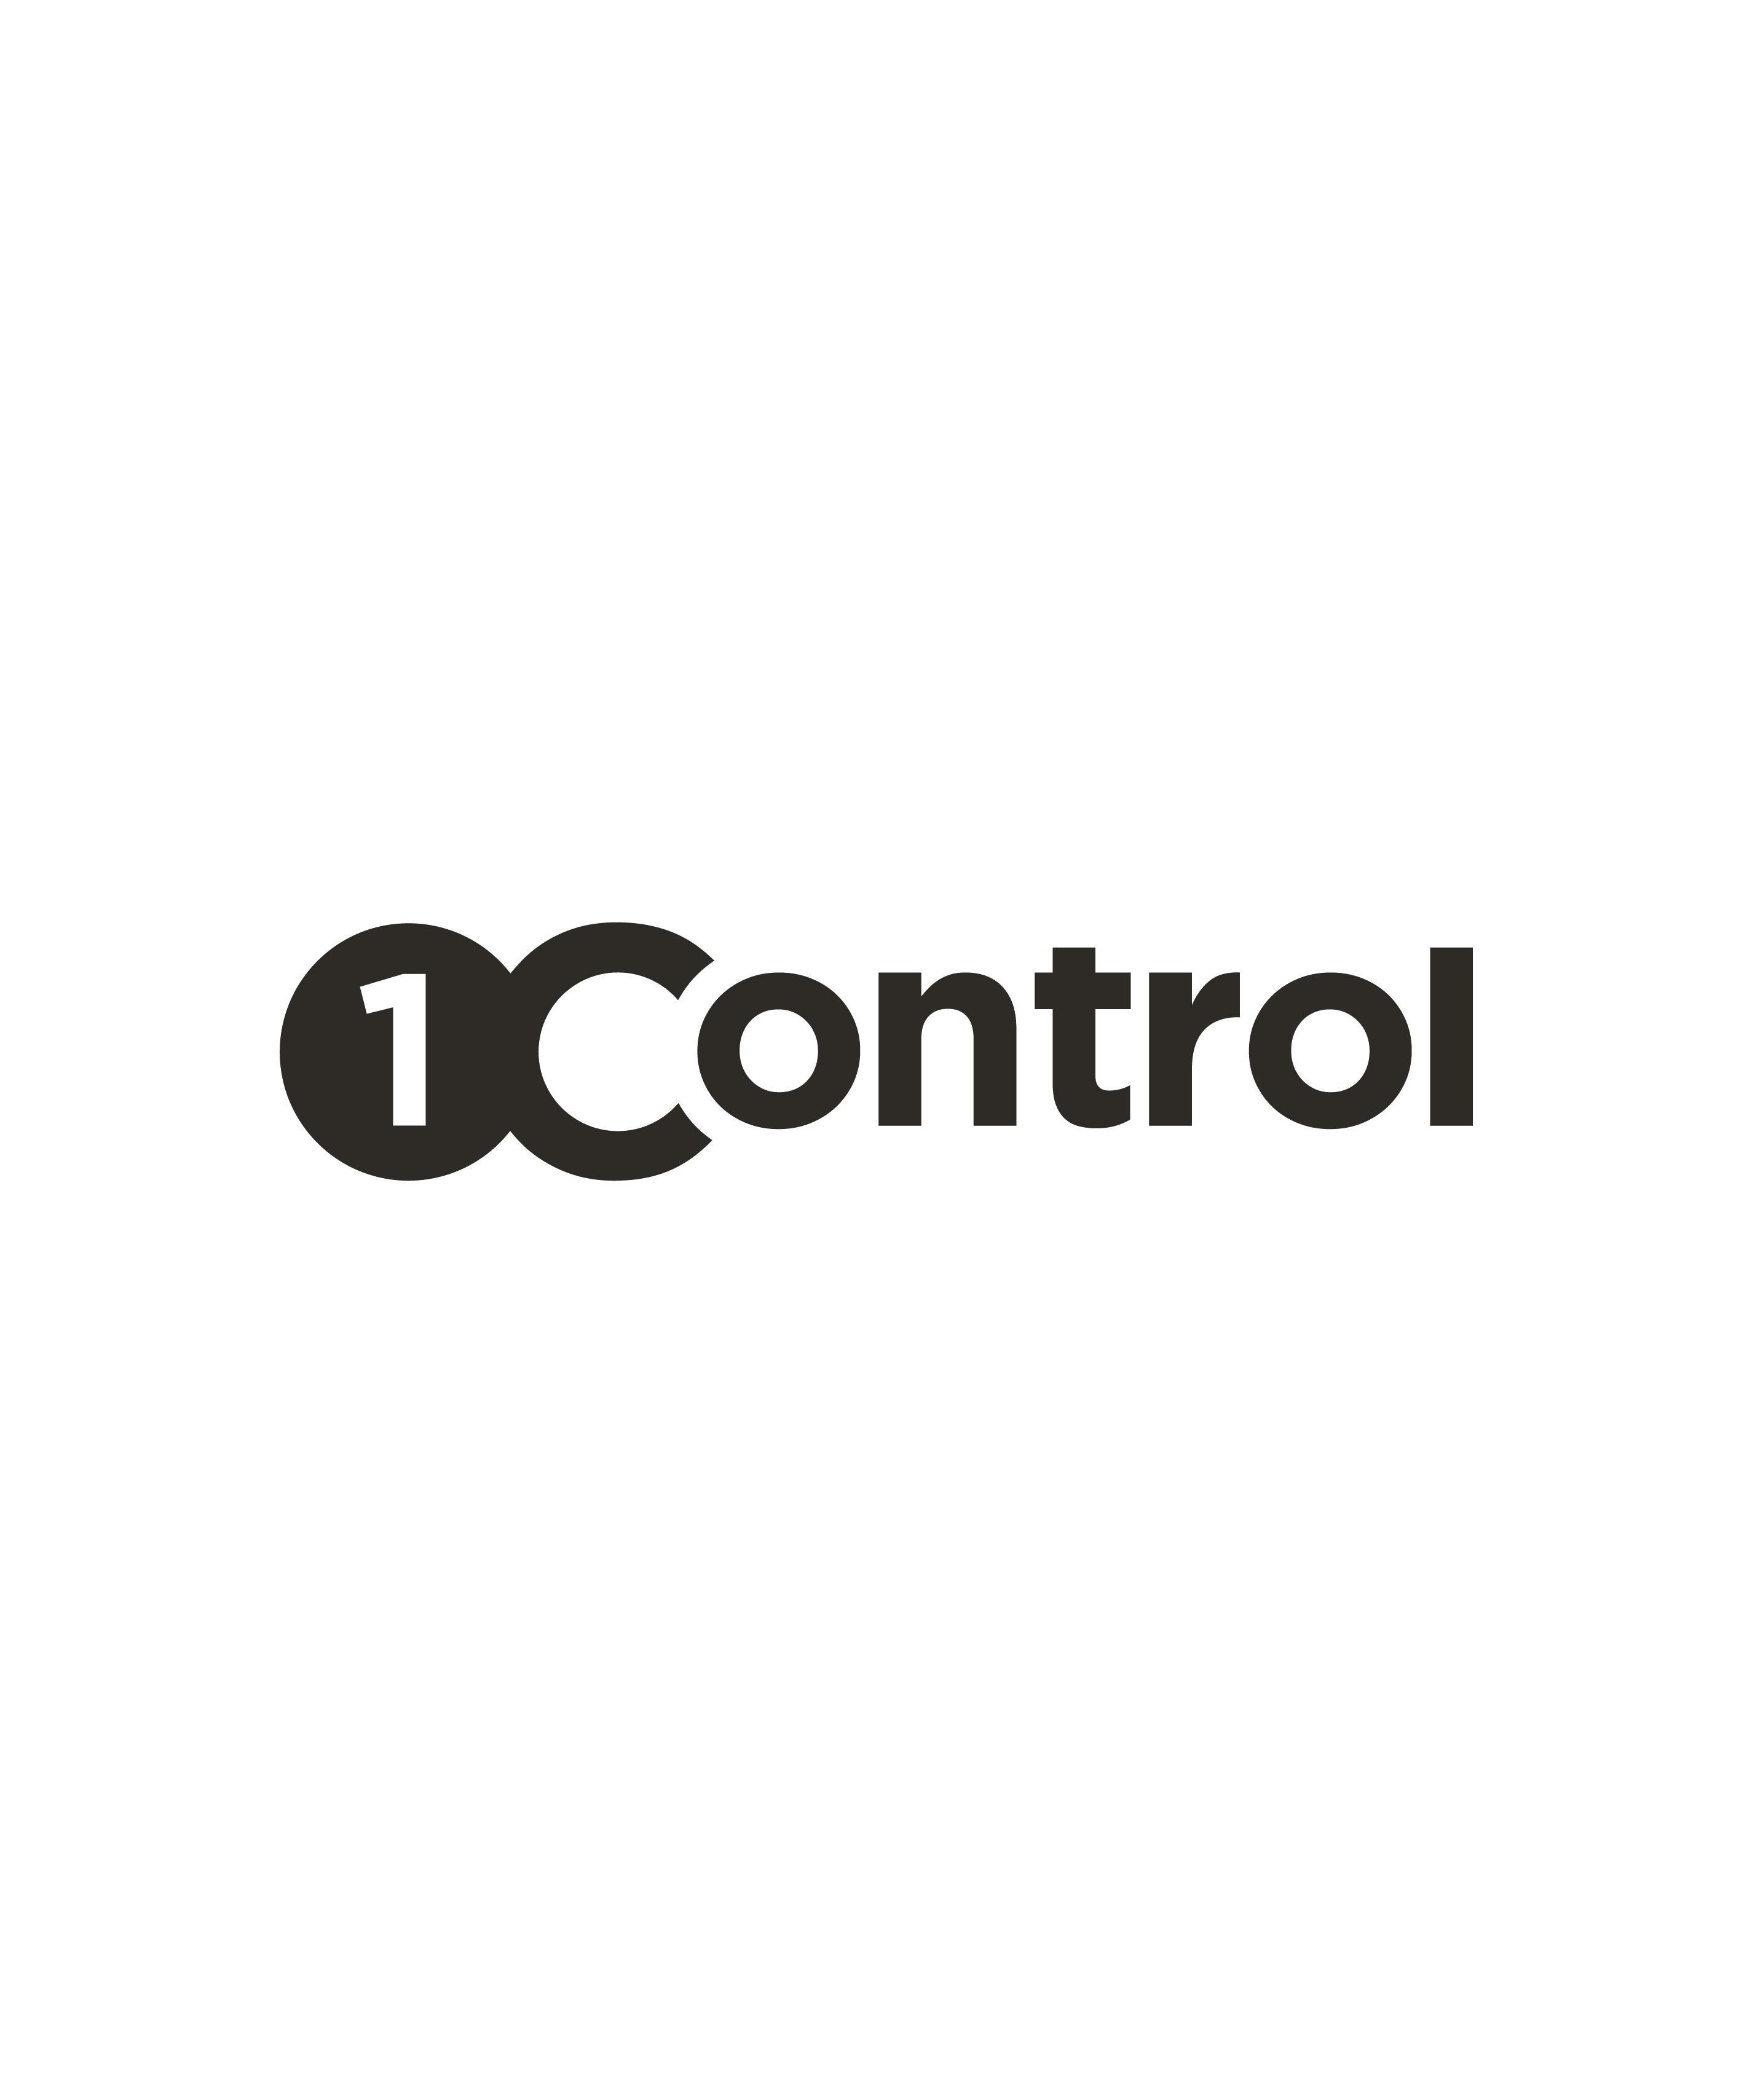 1Control